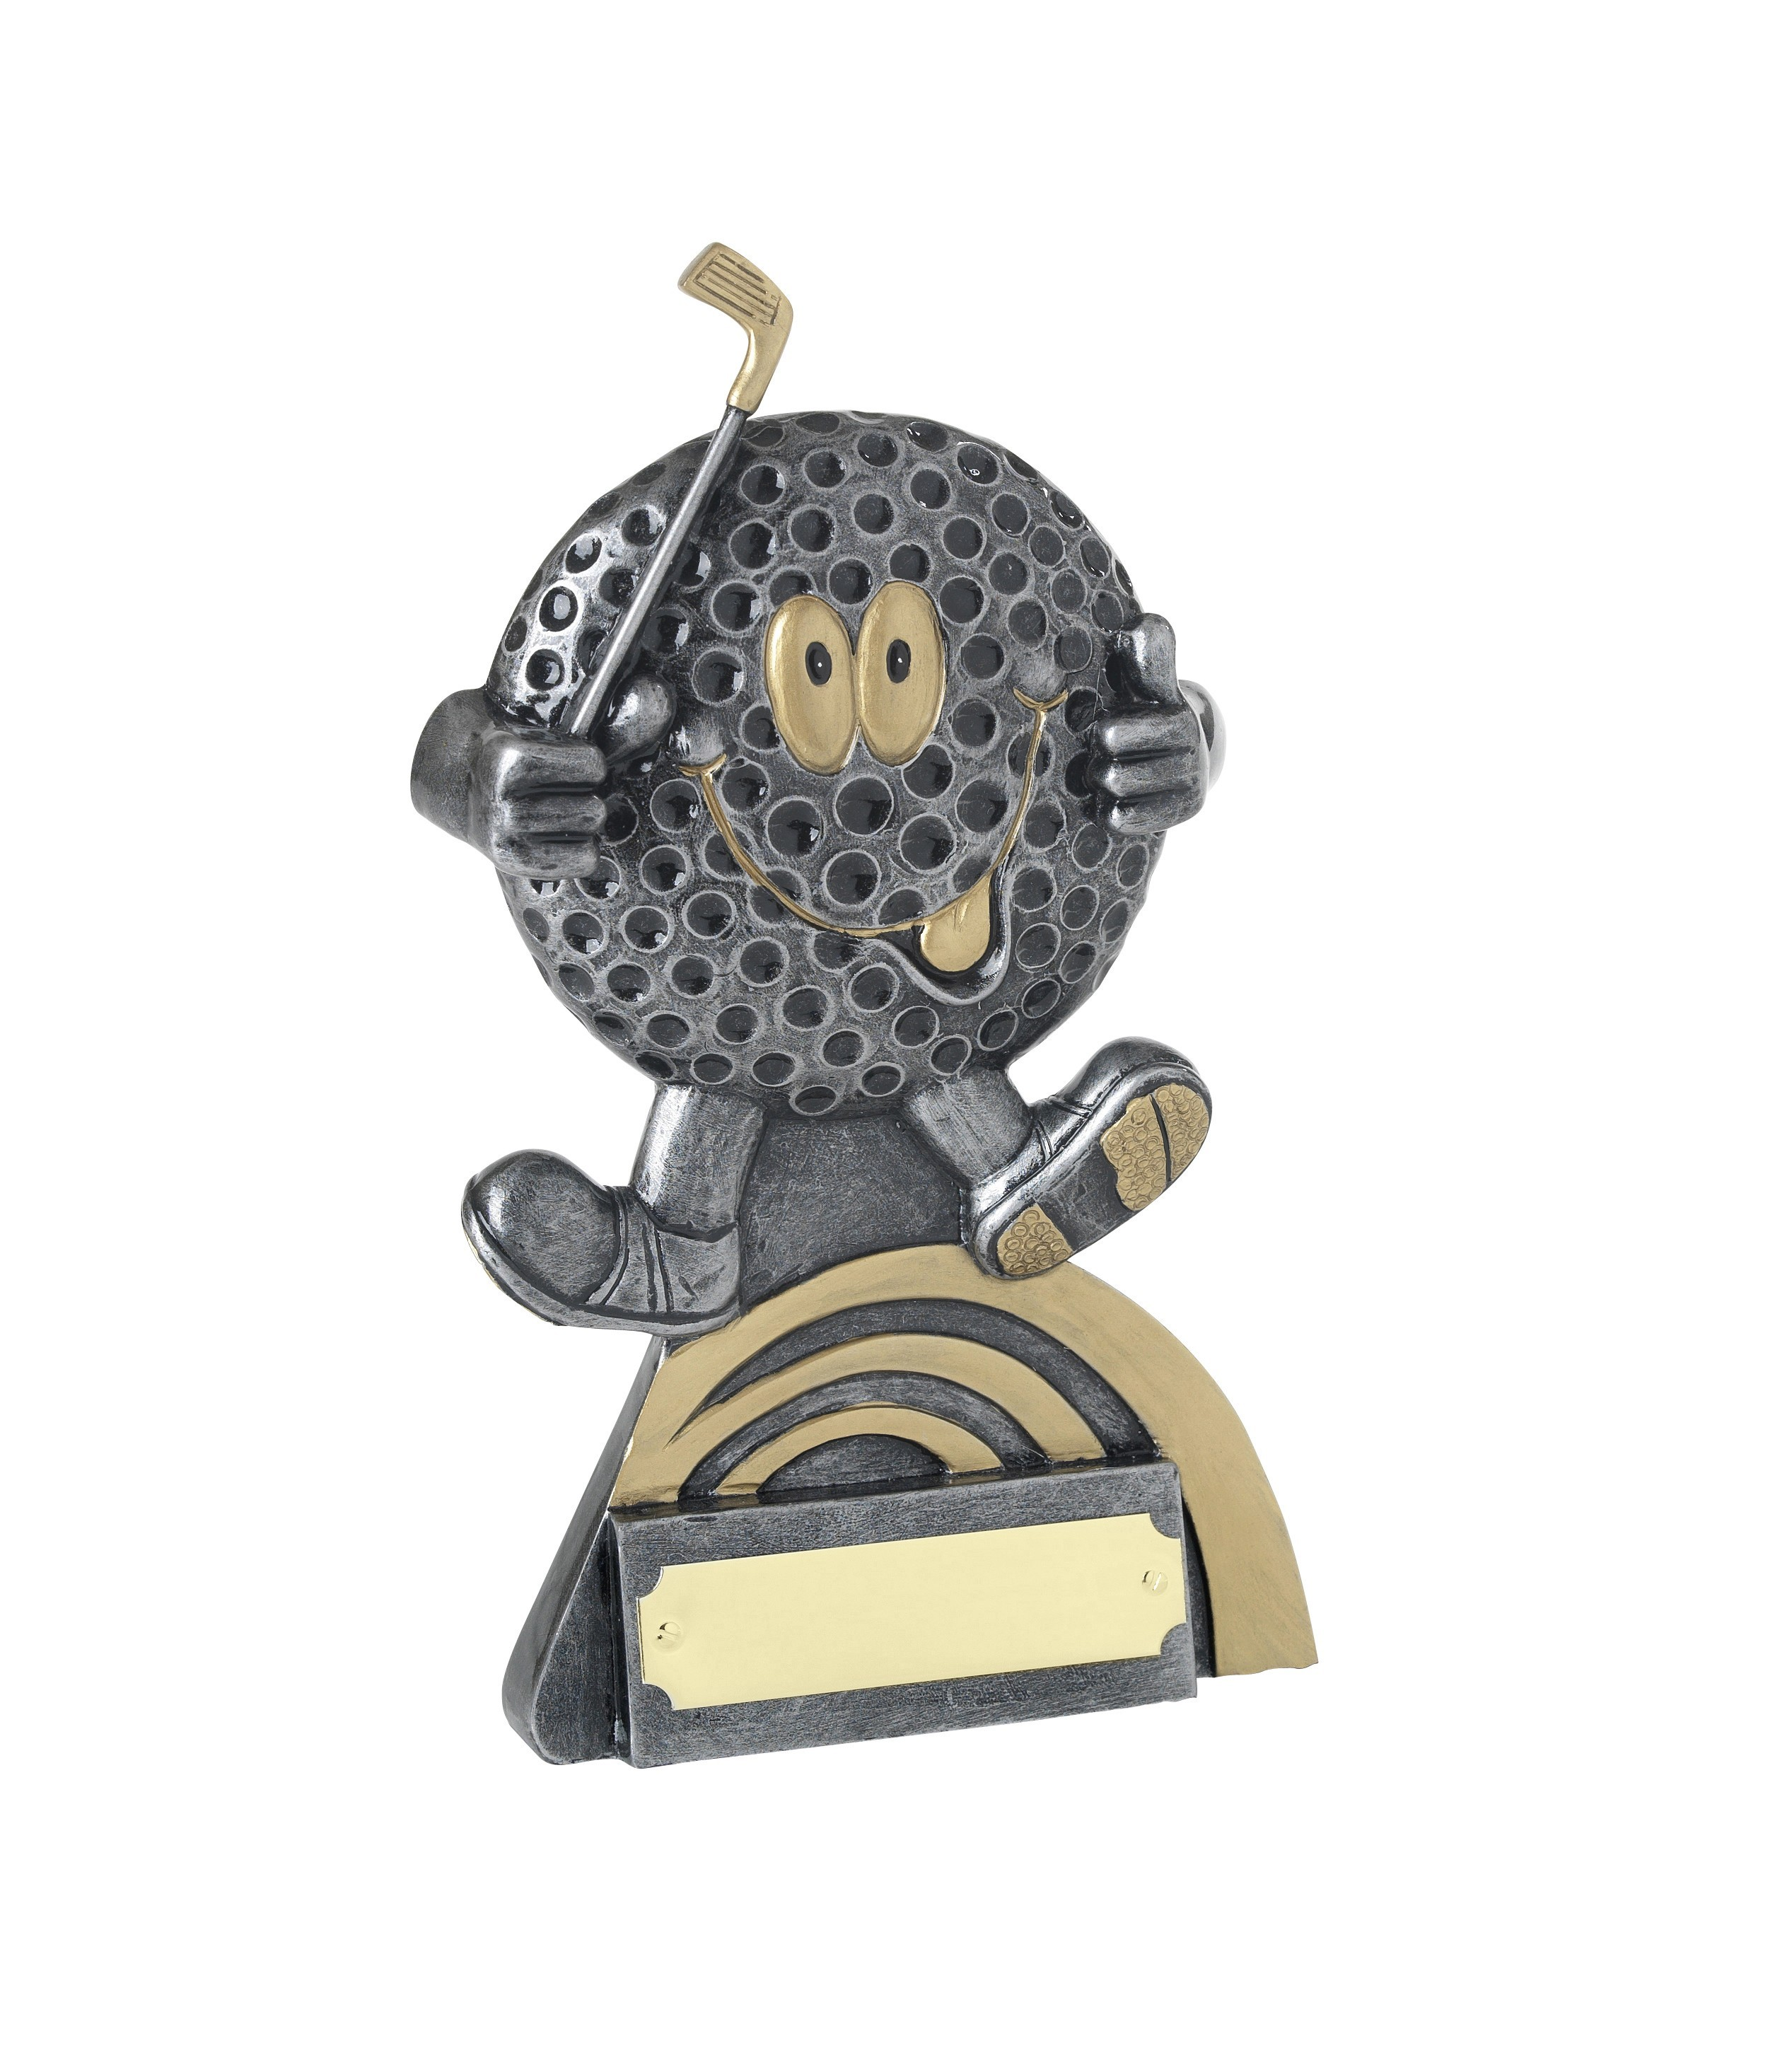 13cm Humerous Golf Award